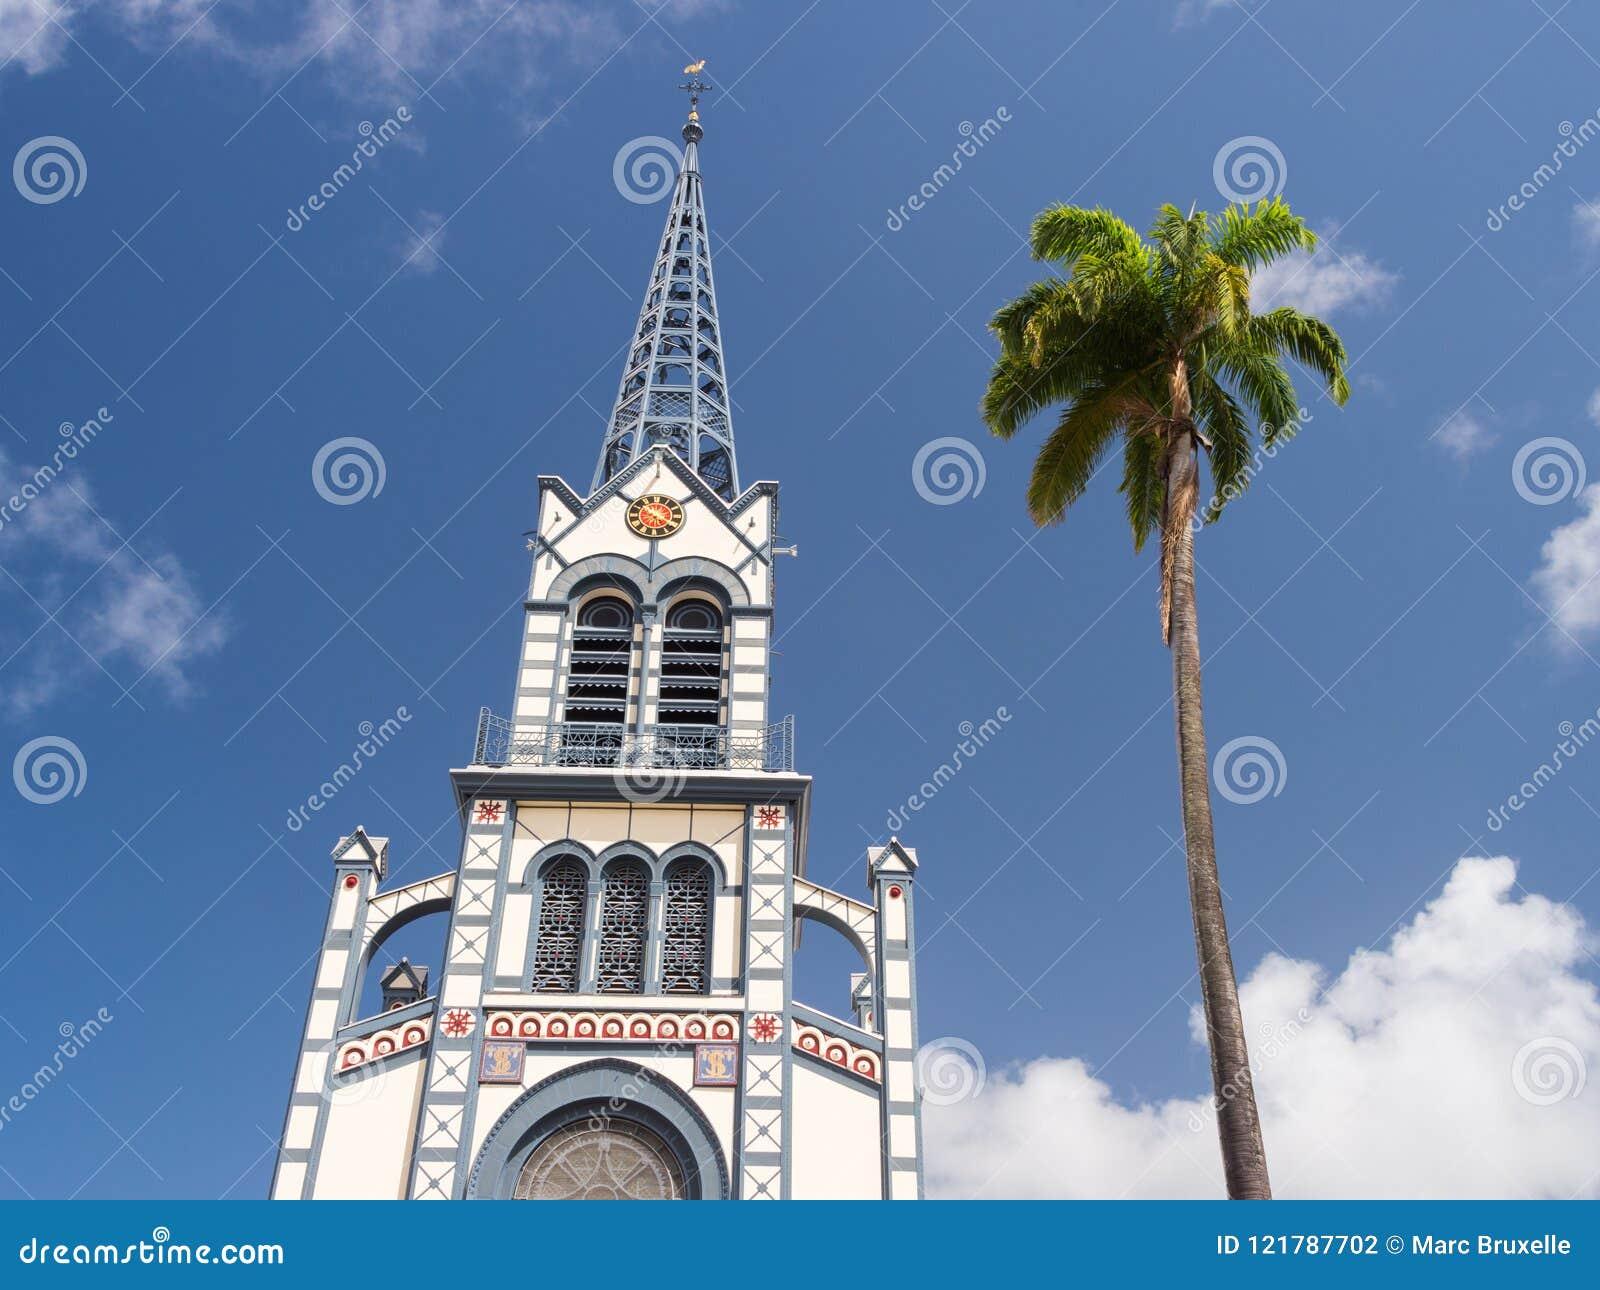 Cathedrale Saint Louis i Martinique, västra Indies